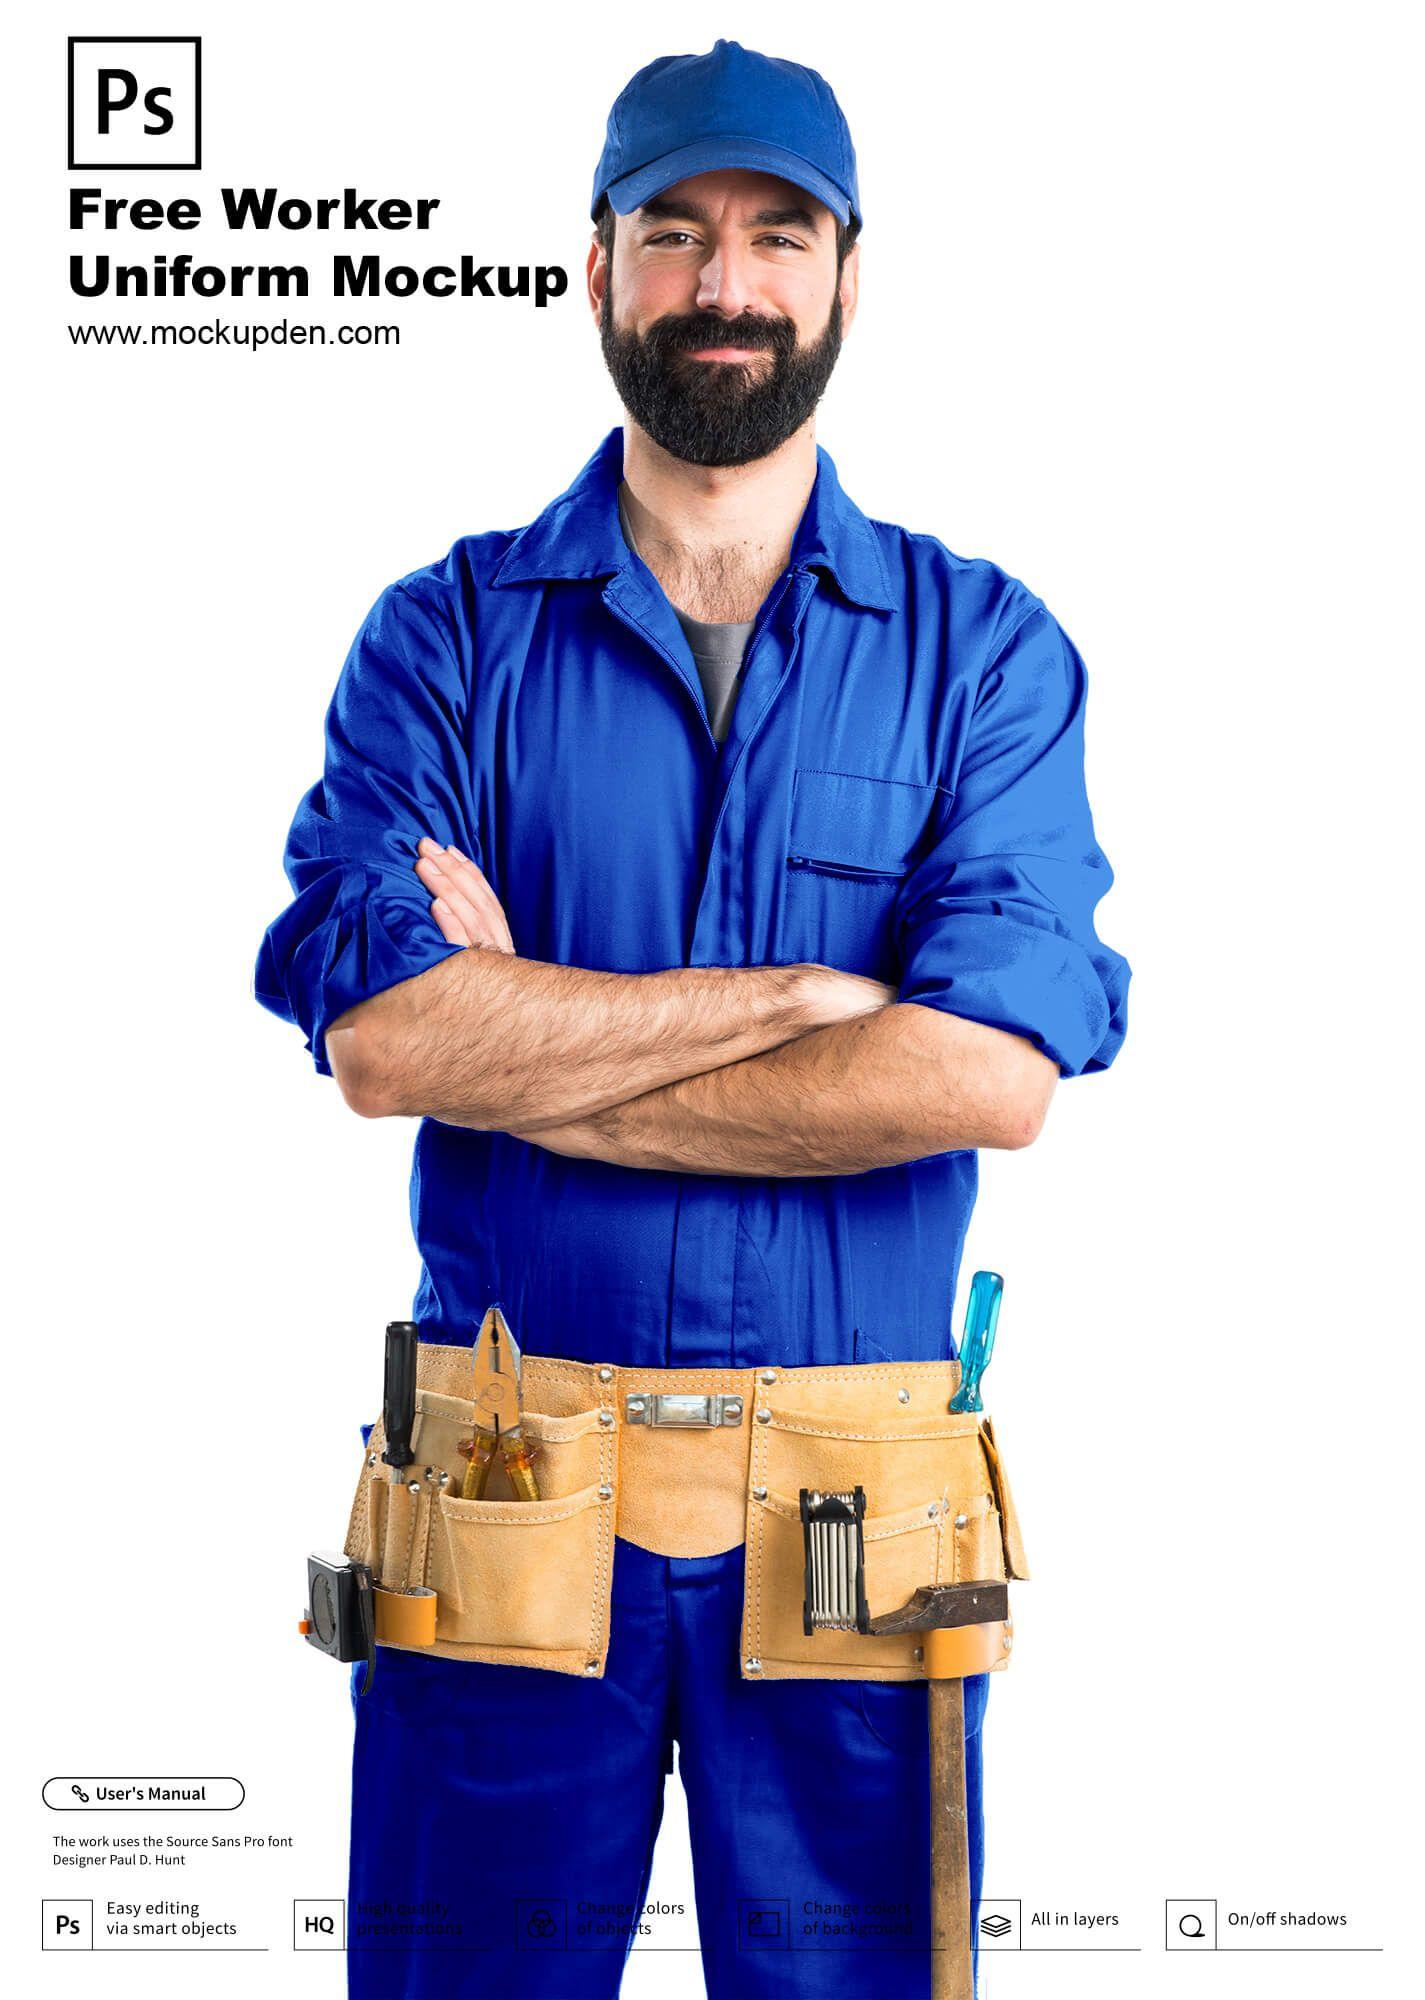 Free Worker Uniform Mockup Psd Template Clothing Mockup Mockup Mockup Psd